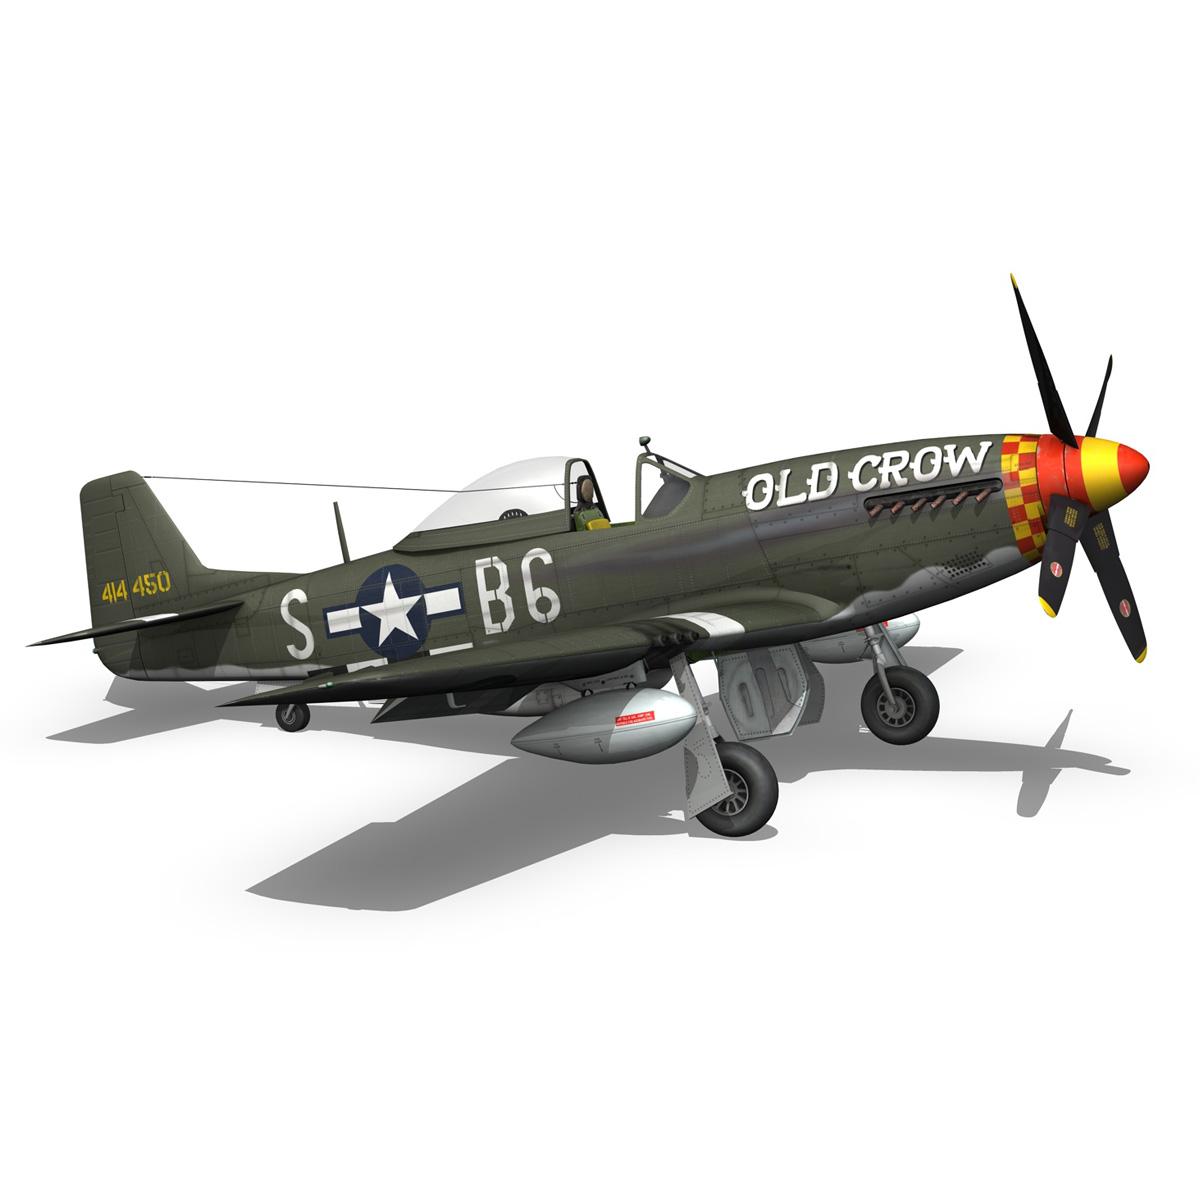 north american p-51d mustang – old crow 3d model fbx c4d lwo obj 273346